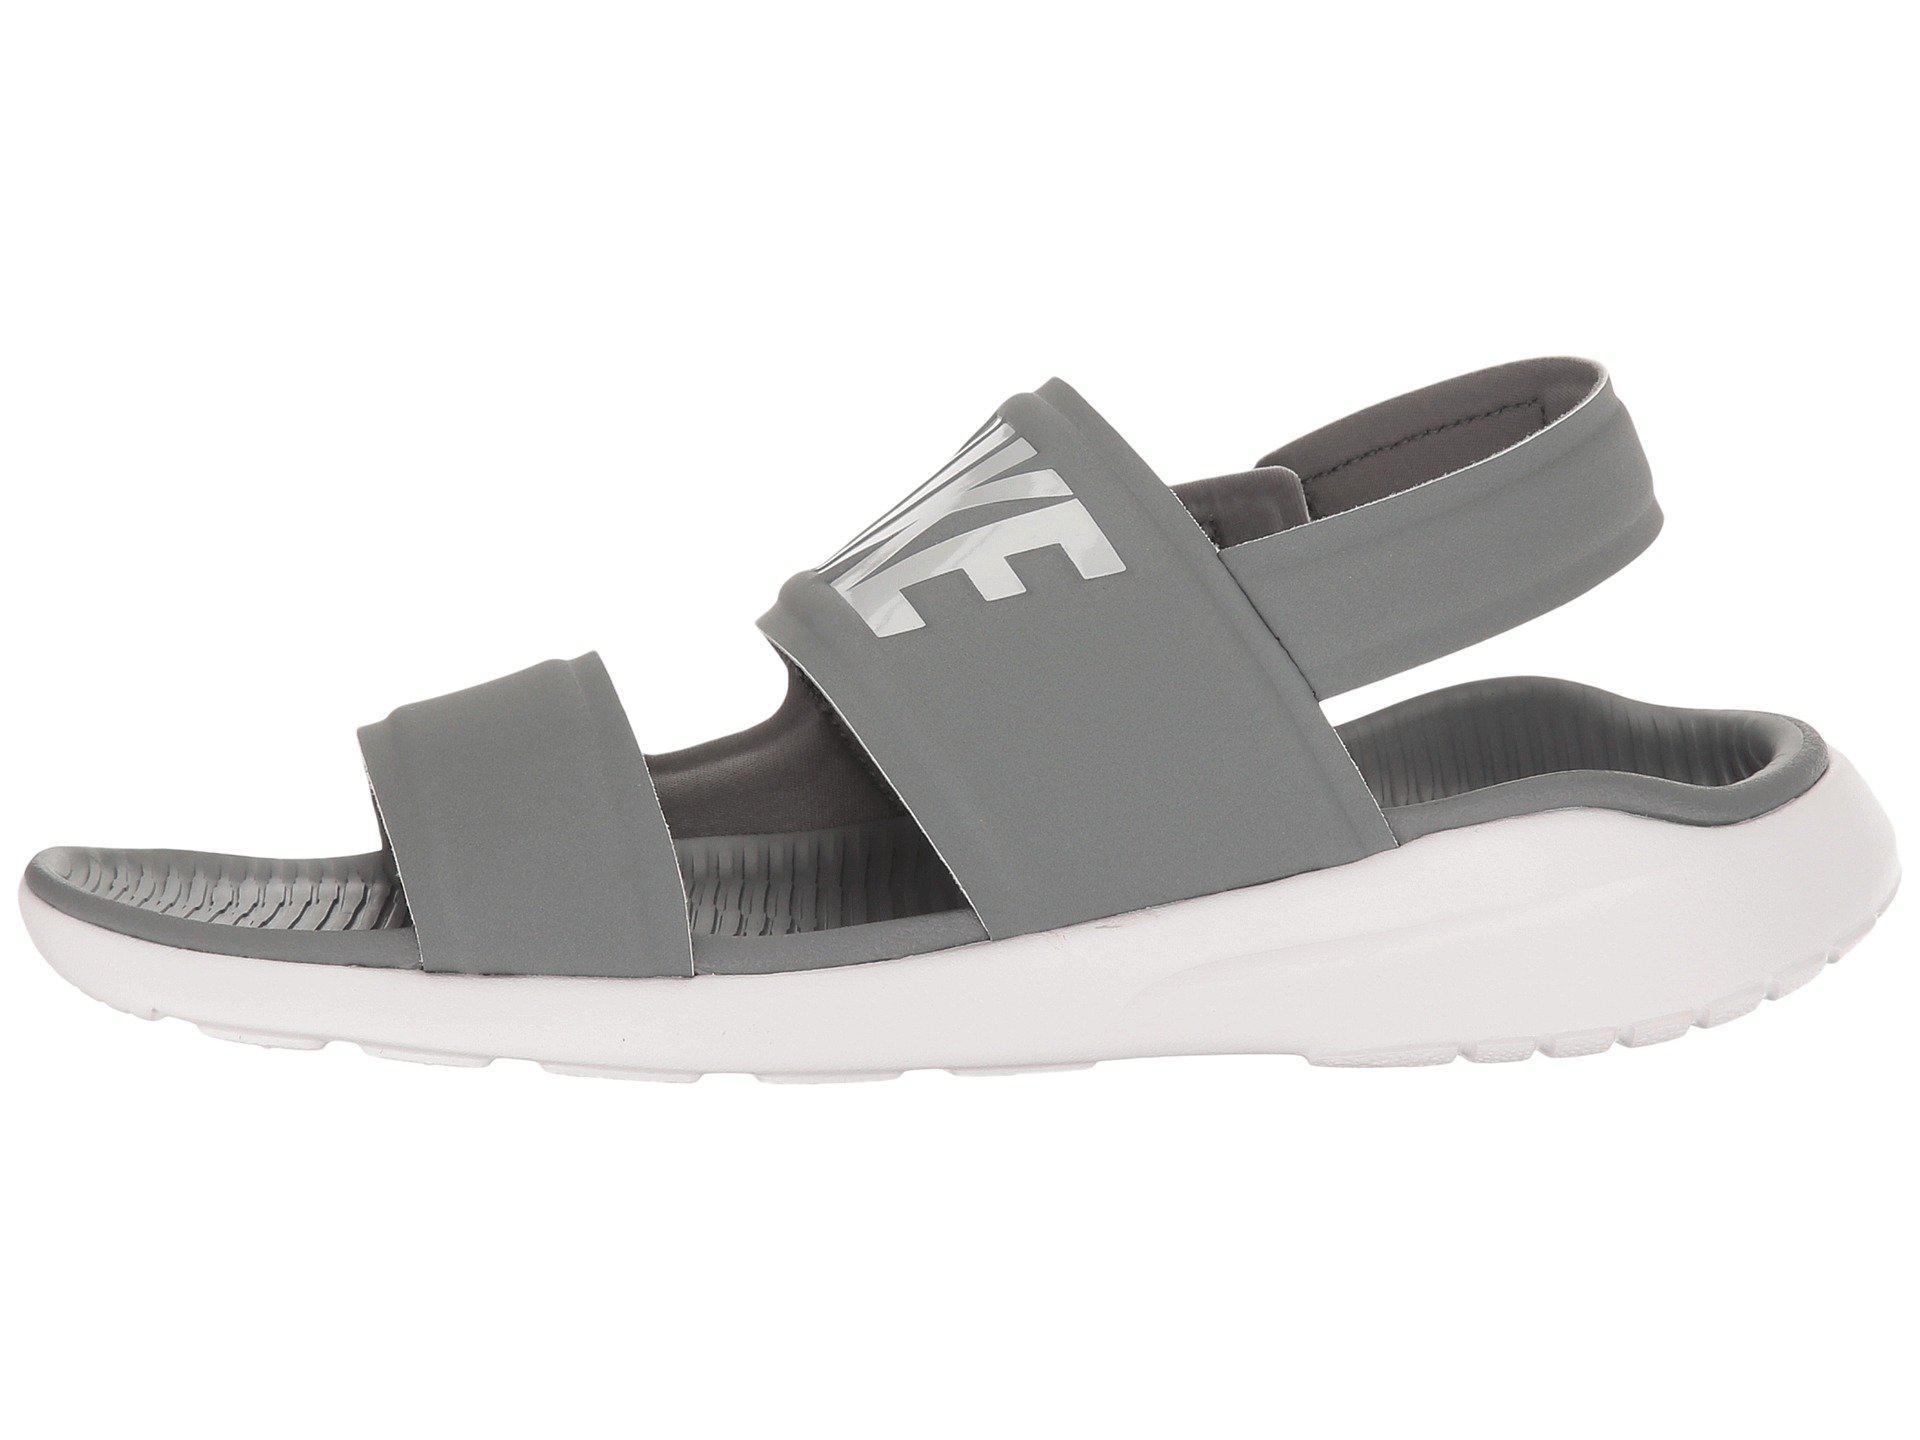 6c1450e2b501 Lyst - Nike Tanjun Sandal (black black white) Women s Shoes in Gray